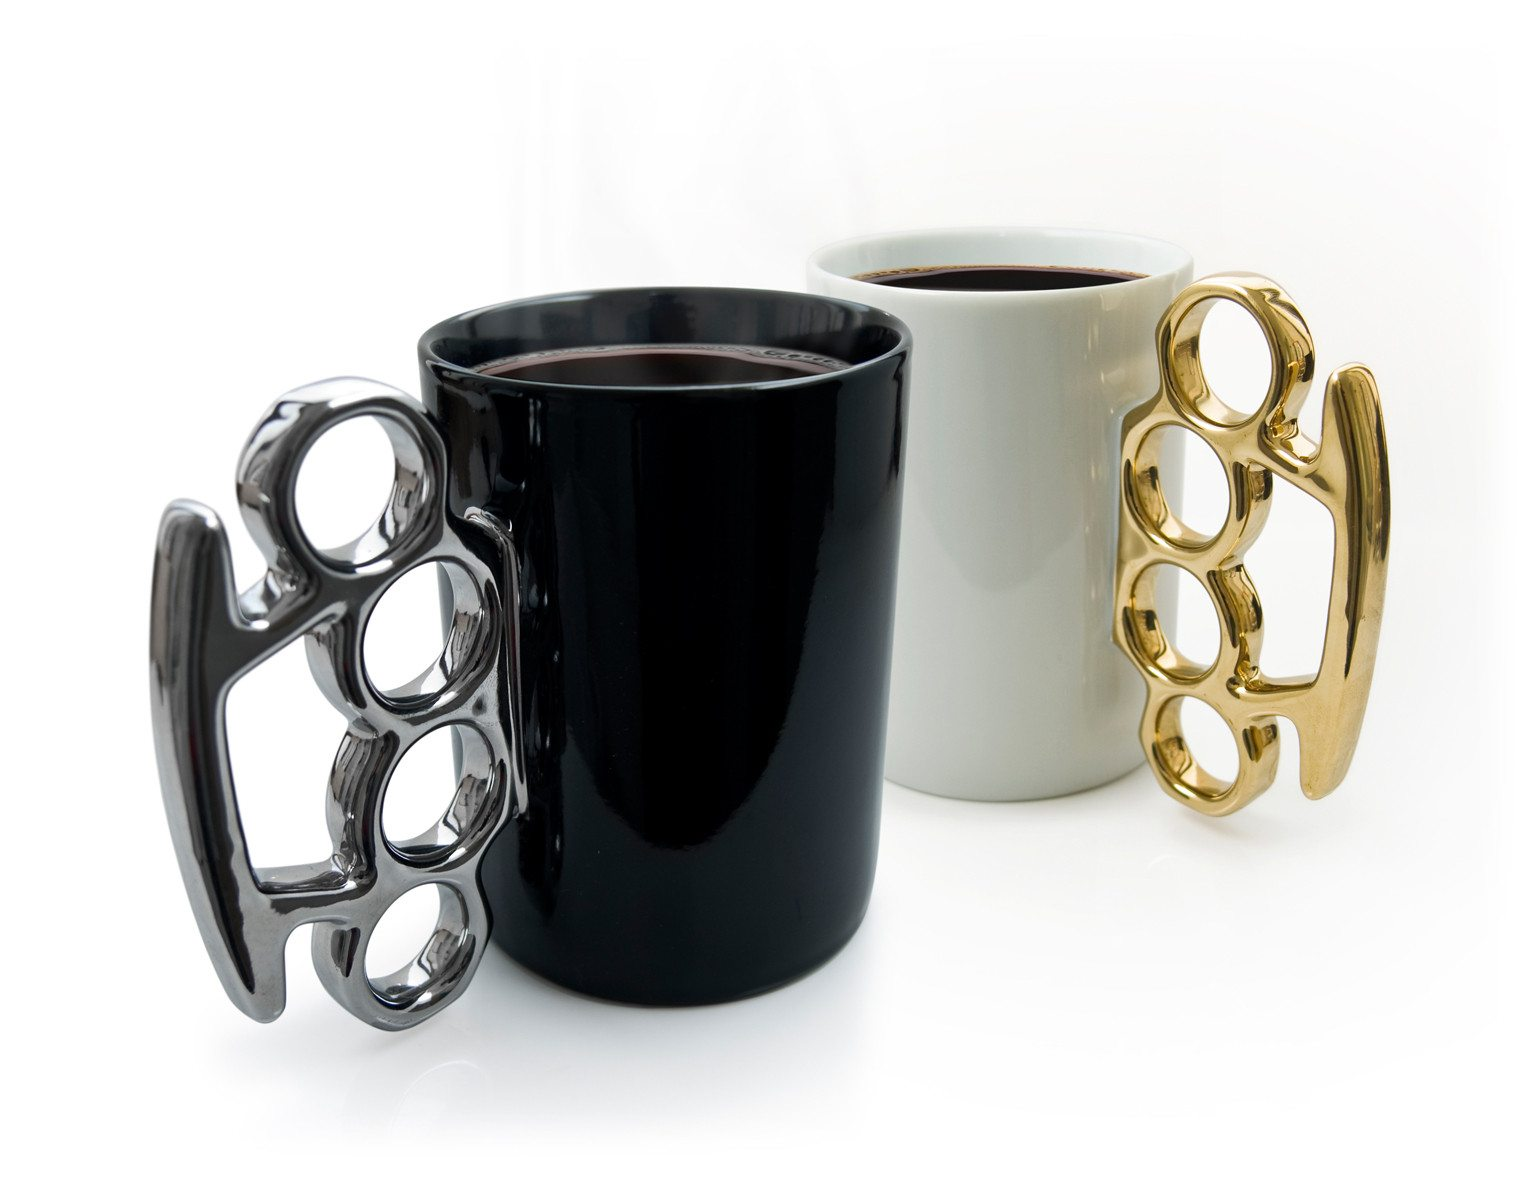 Schlagring Kaffeebecher